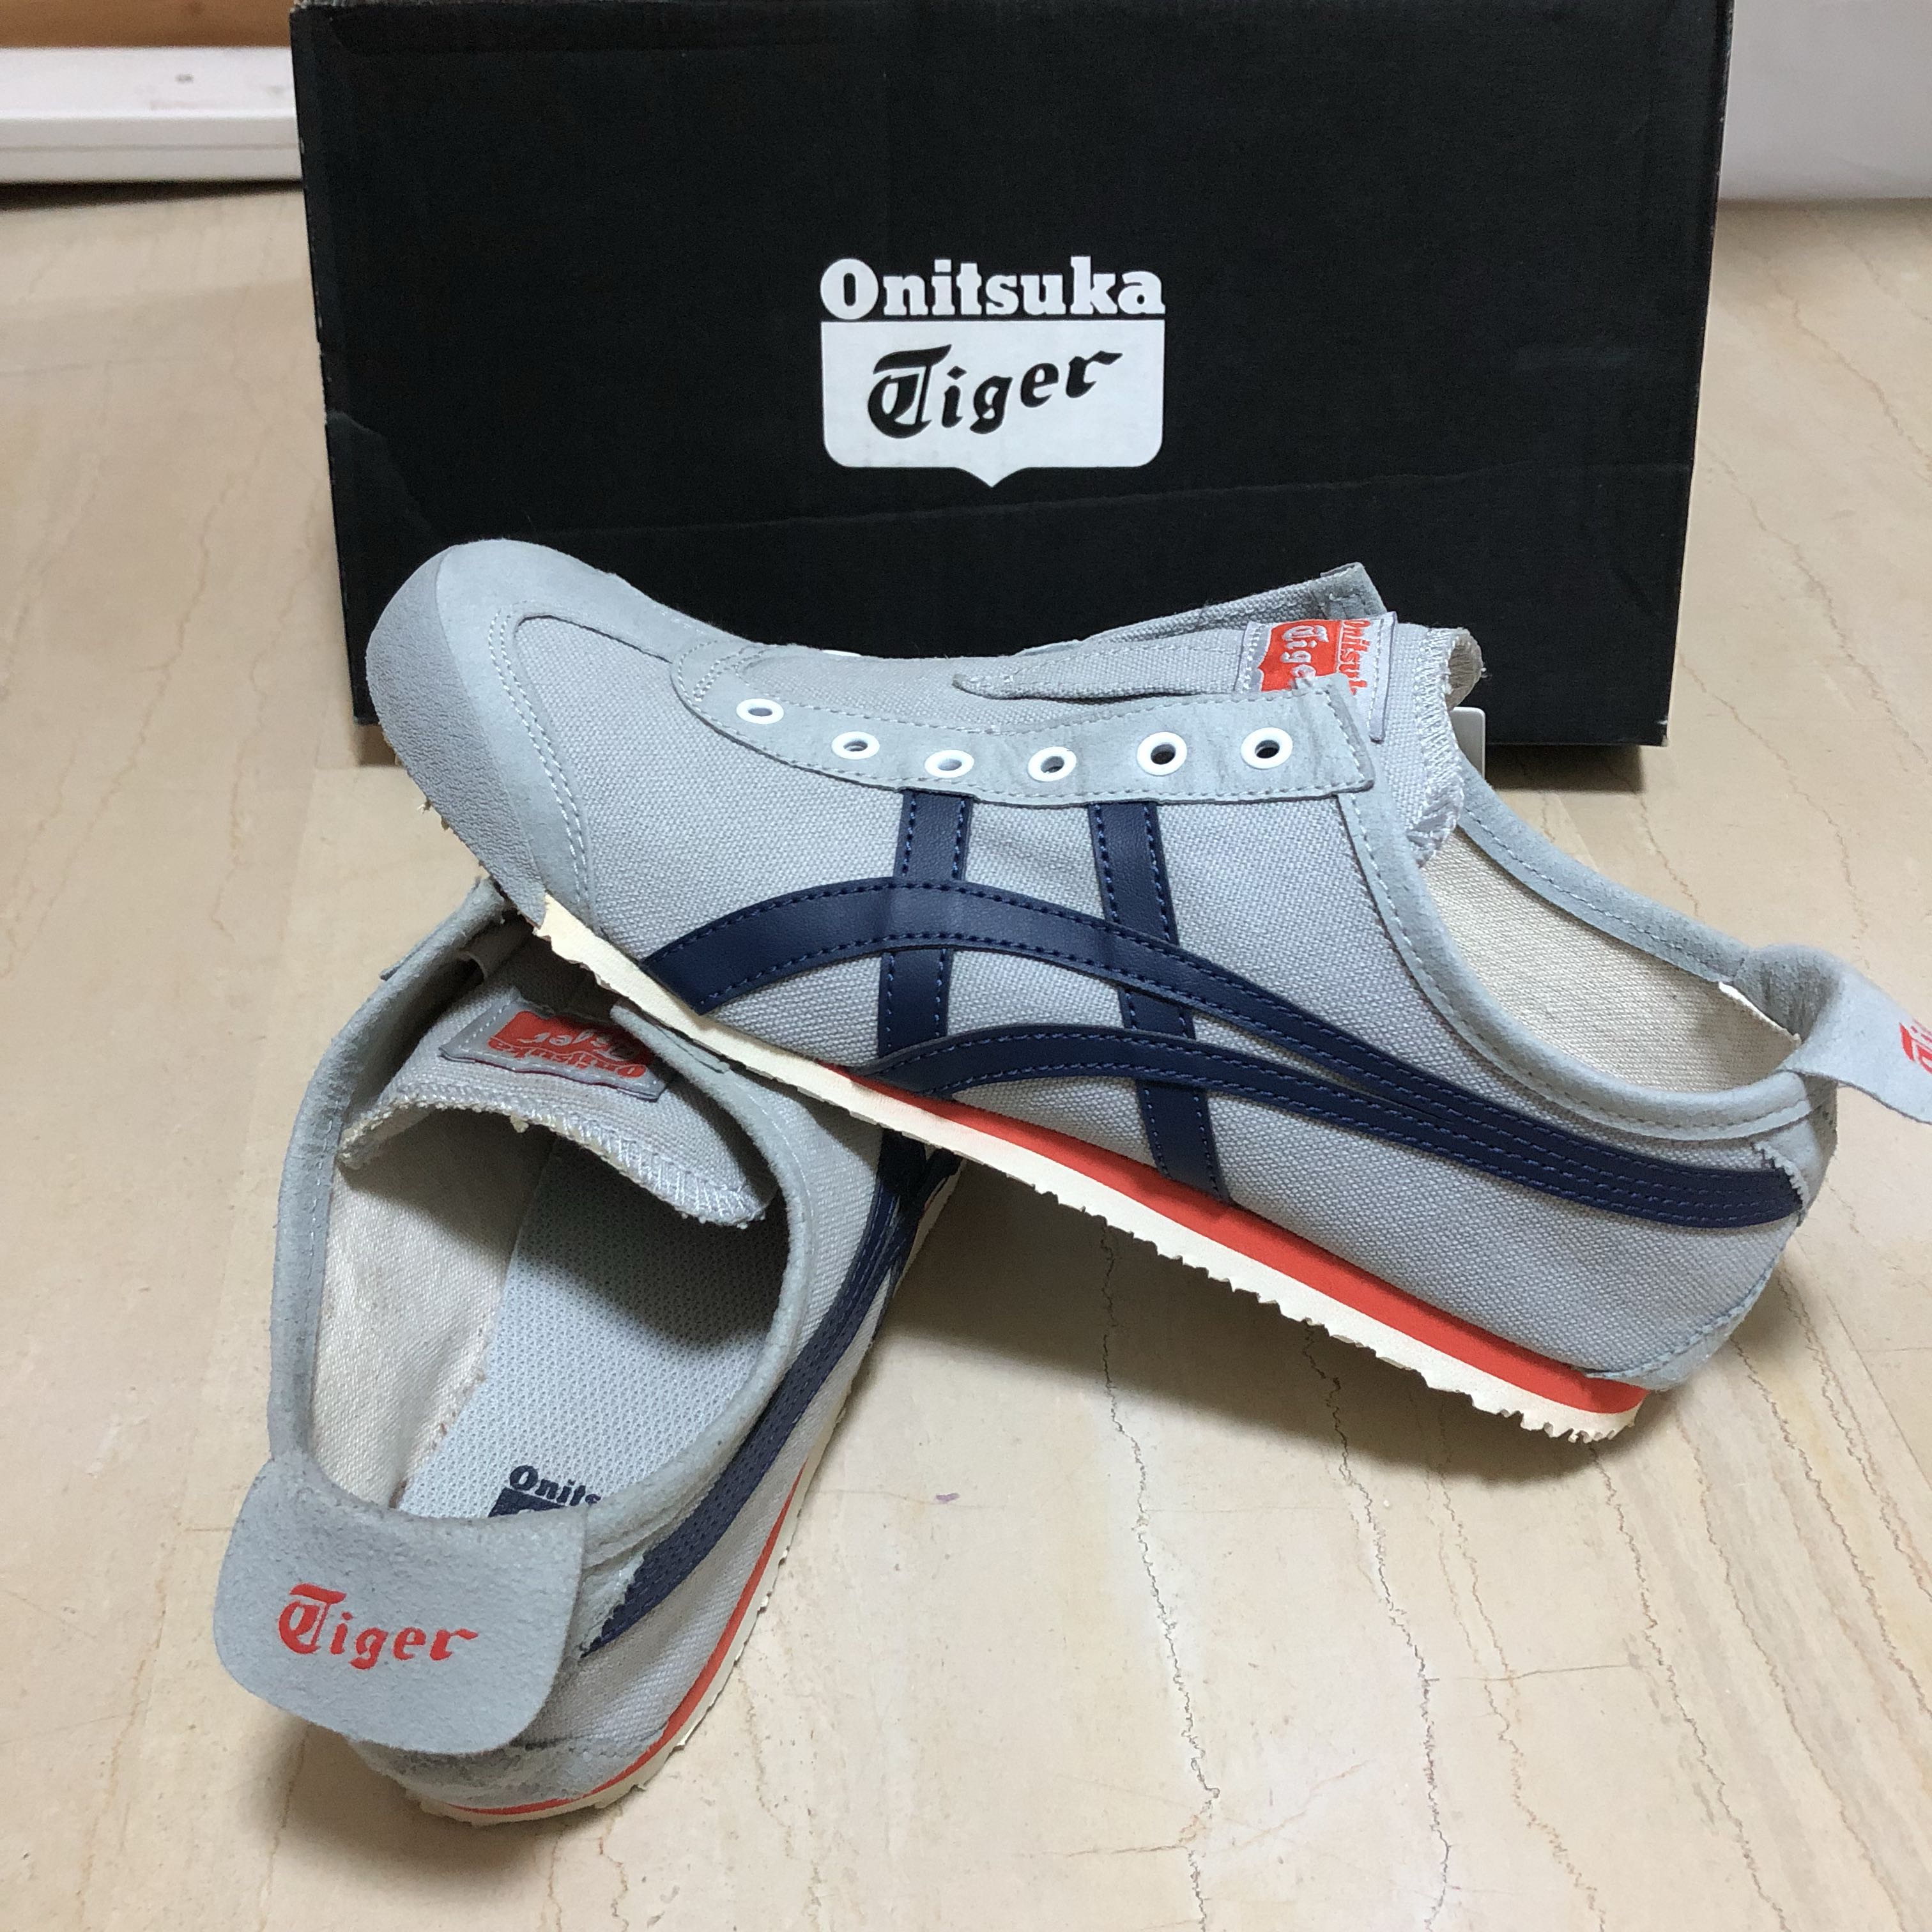 Onitsuka Tiger Slip-on Shoes, Women's